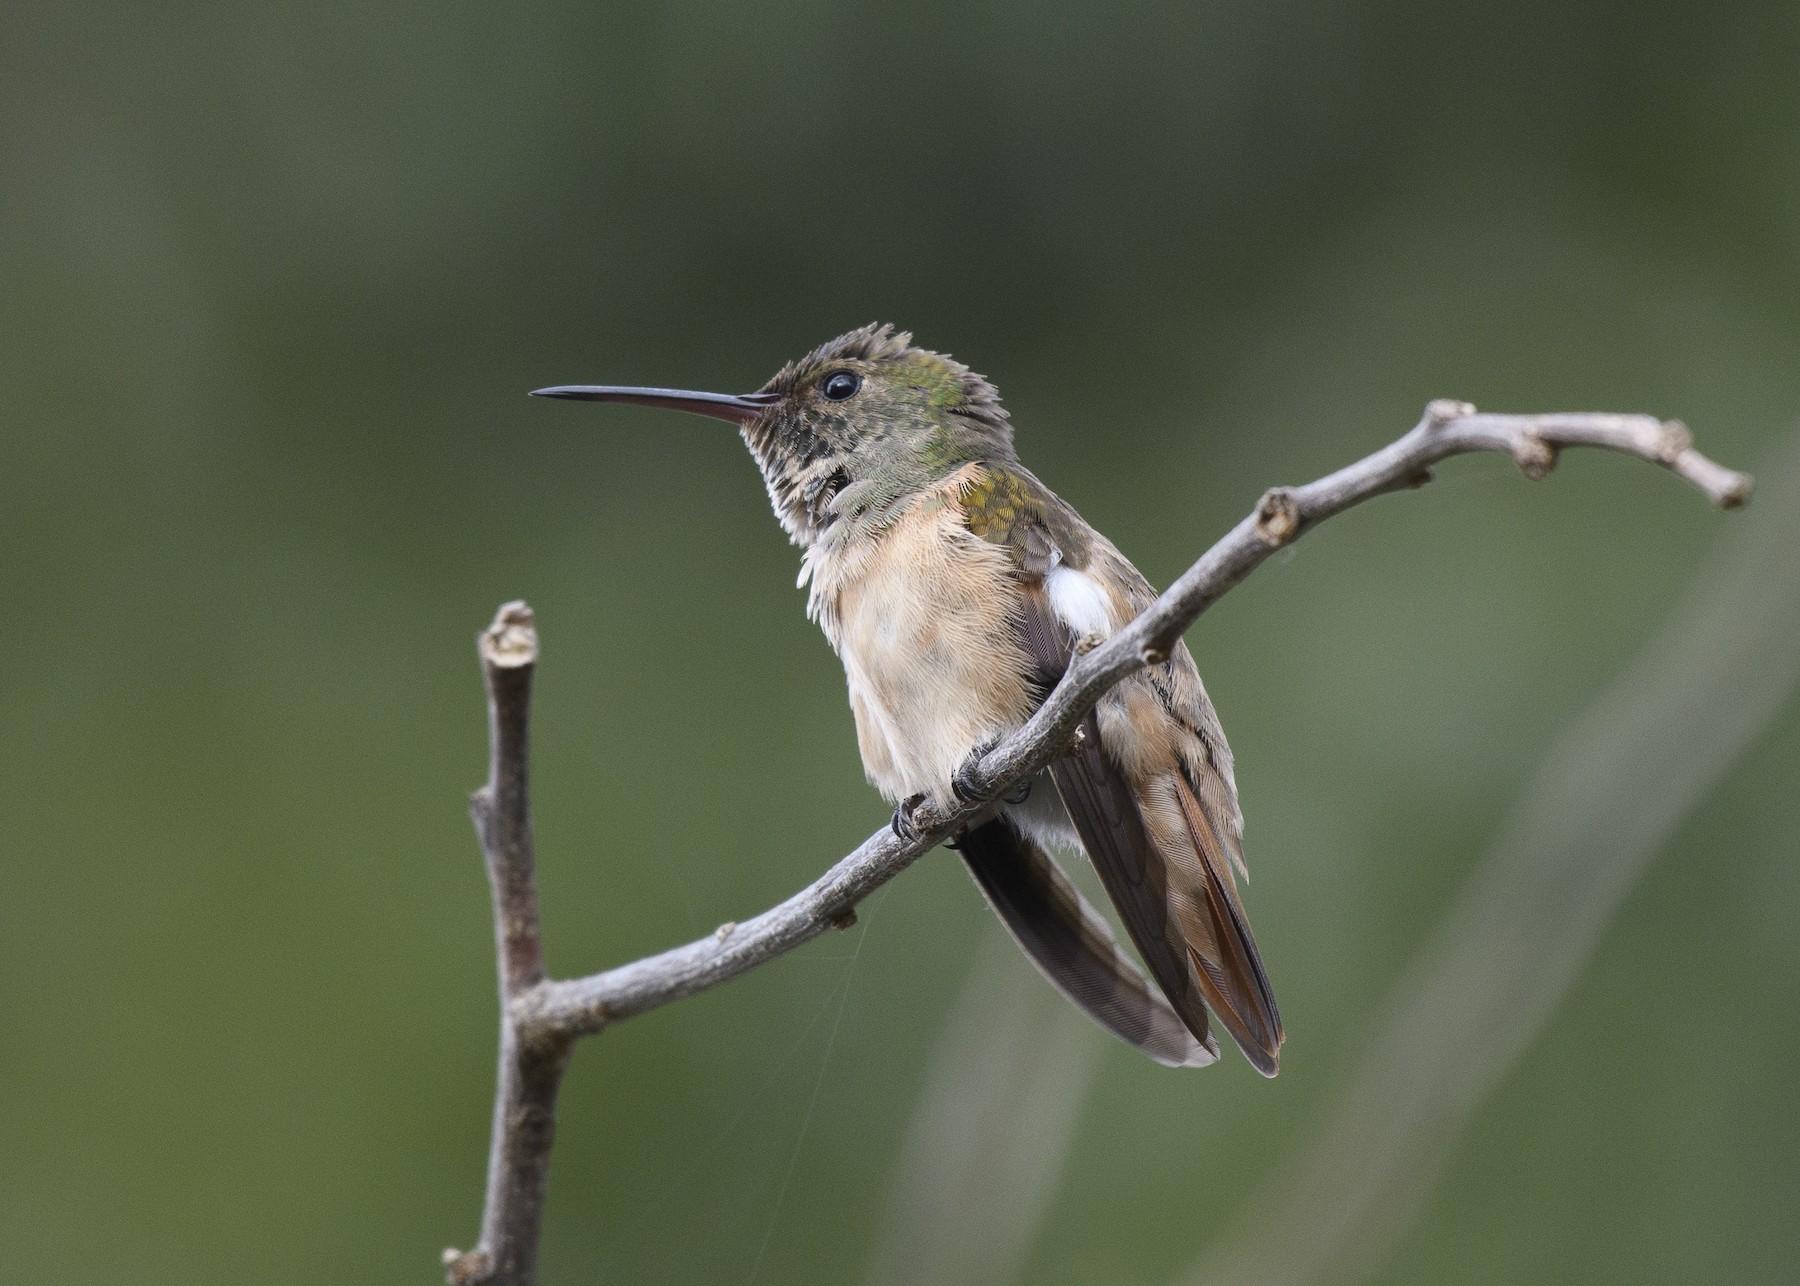 Chestnut-bellied Hummingbird - Anthony Kaduck